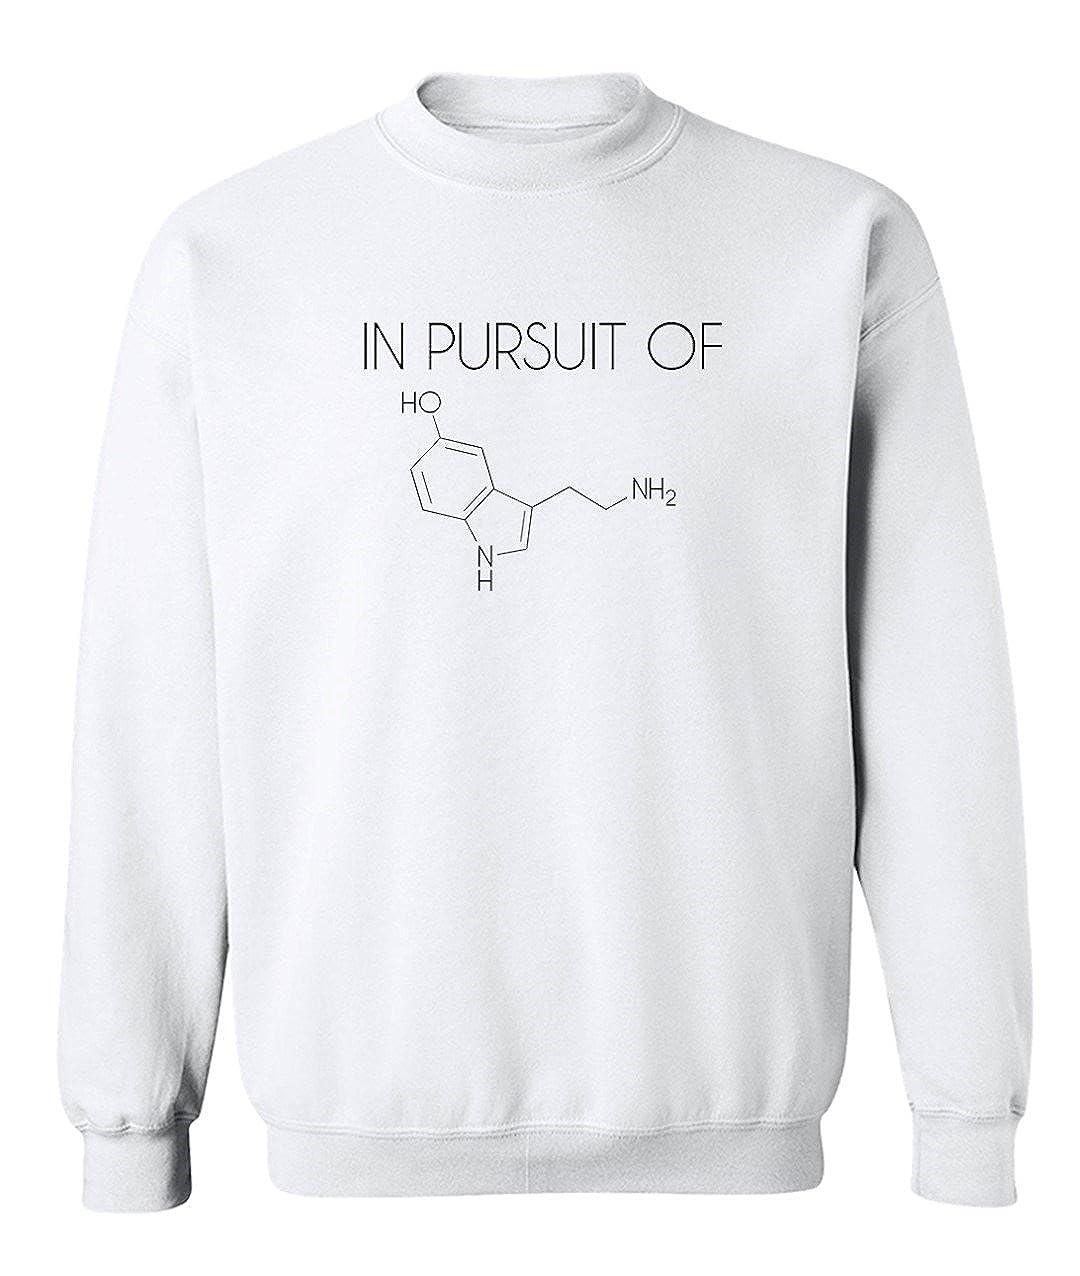 Funny Science Nerd Periodic Table in Pursuit of Hapiness Serotonin Graphic Design Crew Neck Sweatshirt